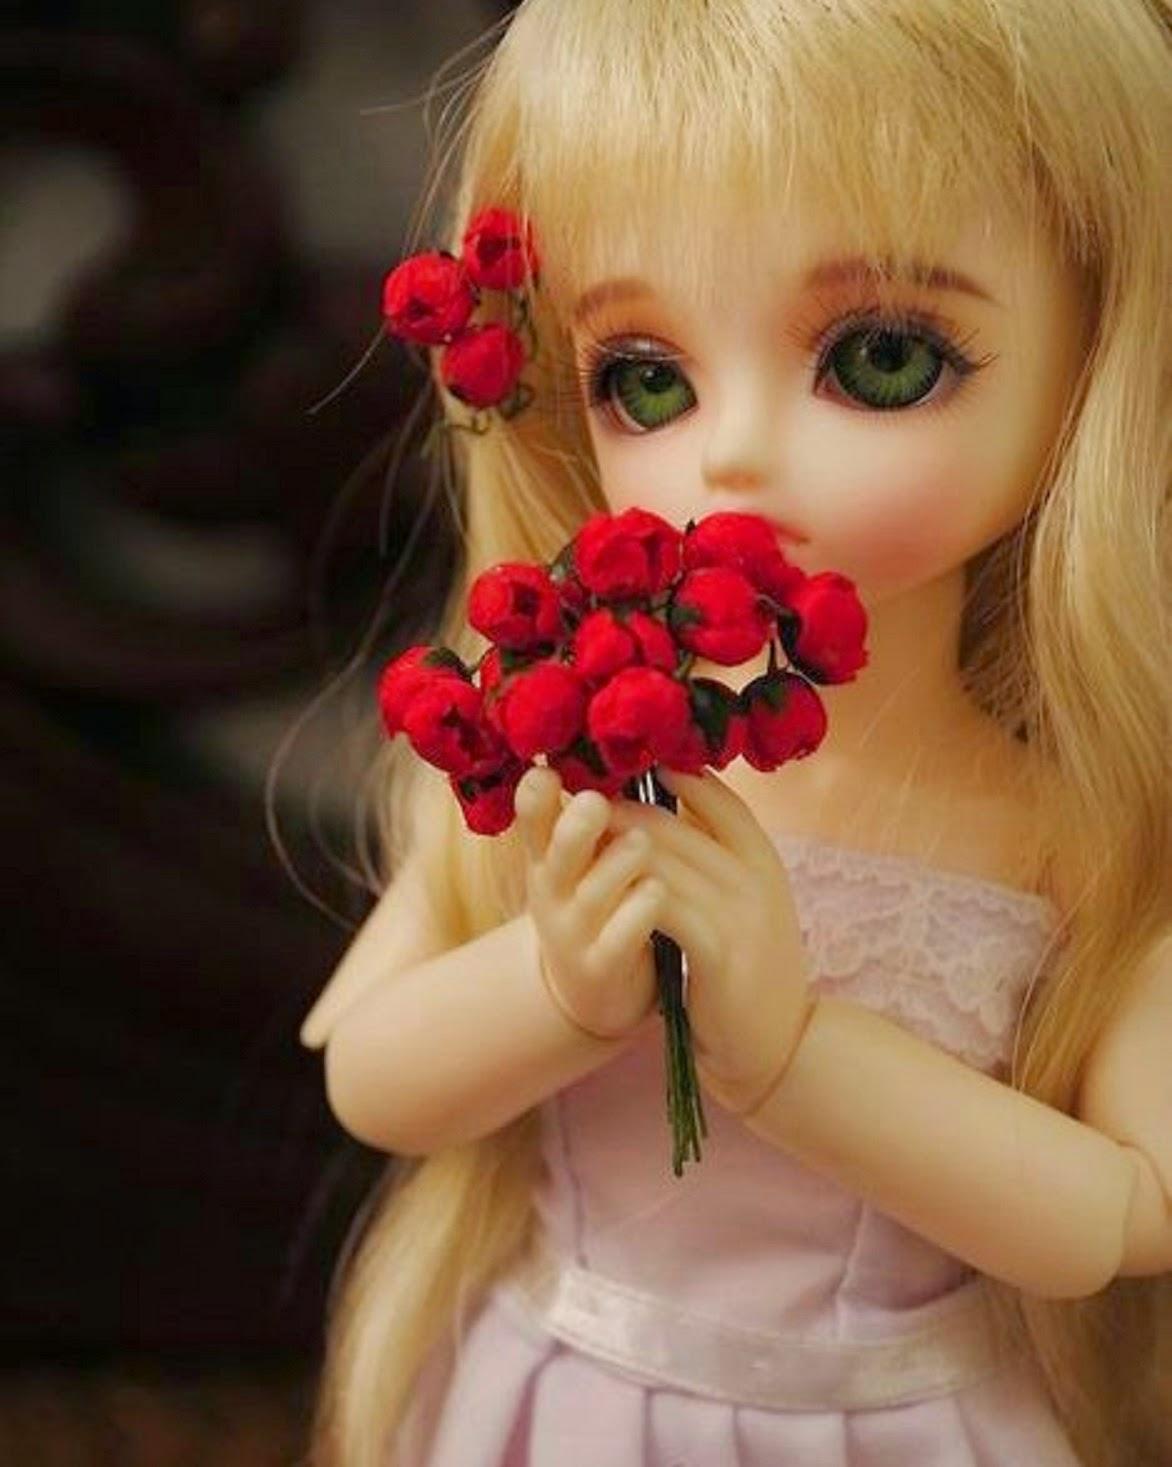 beautiful doll hd wallpapers - photo #38